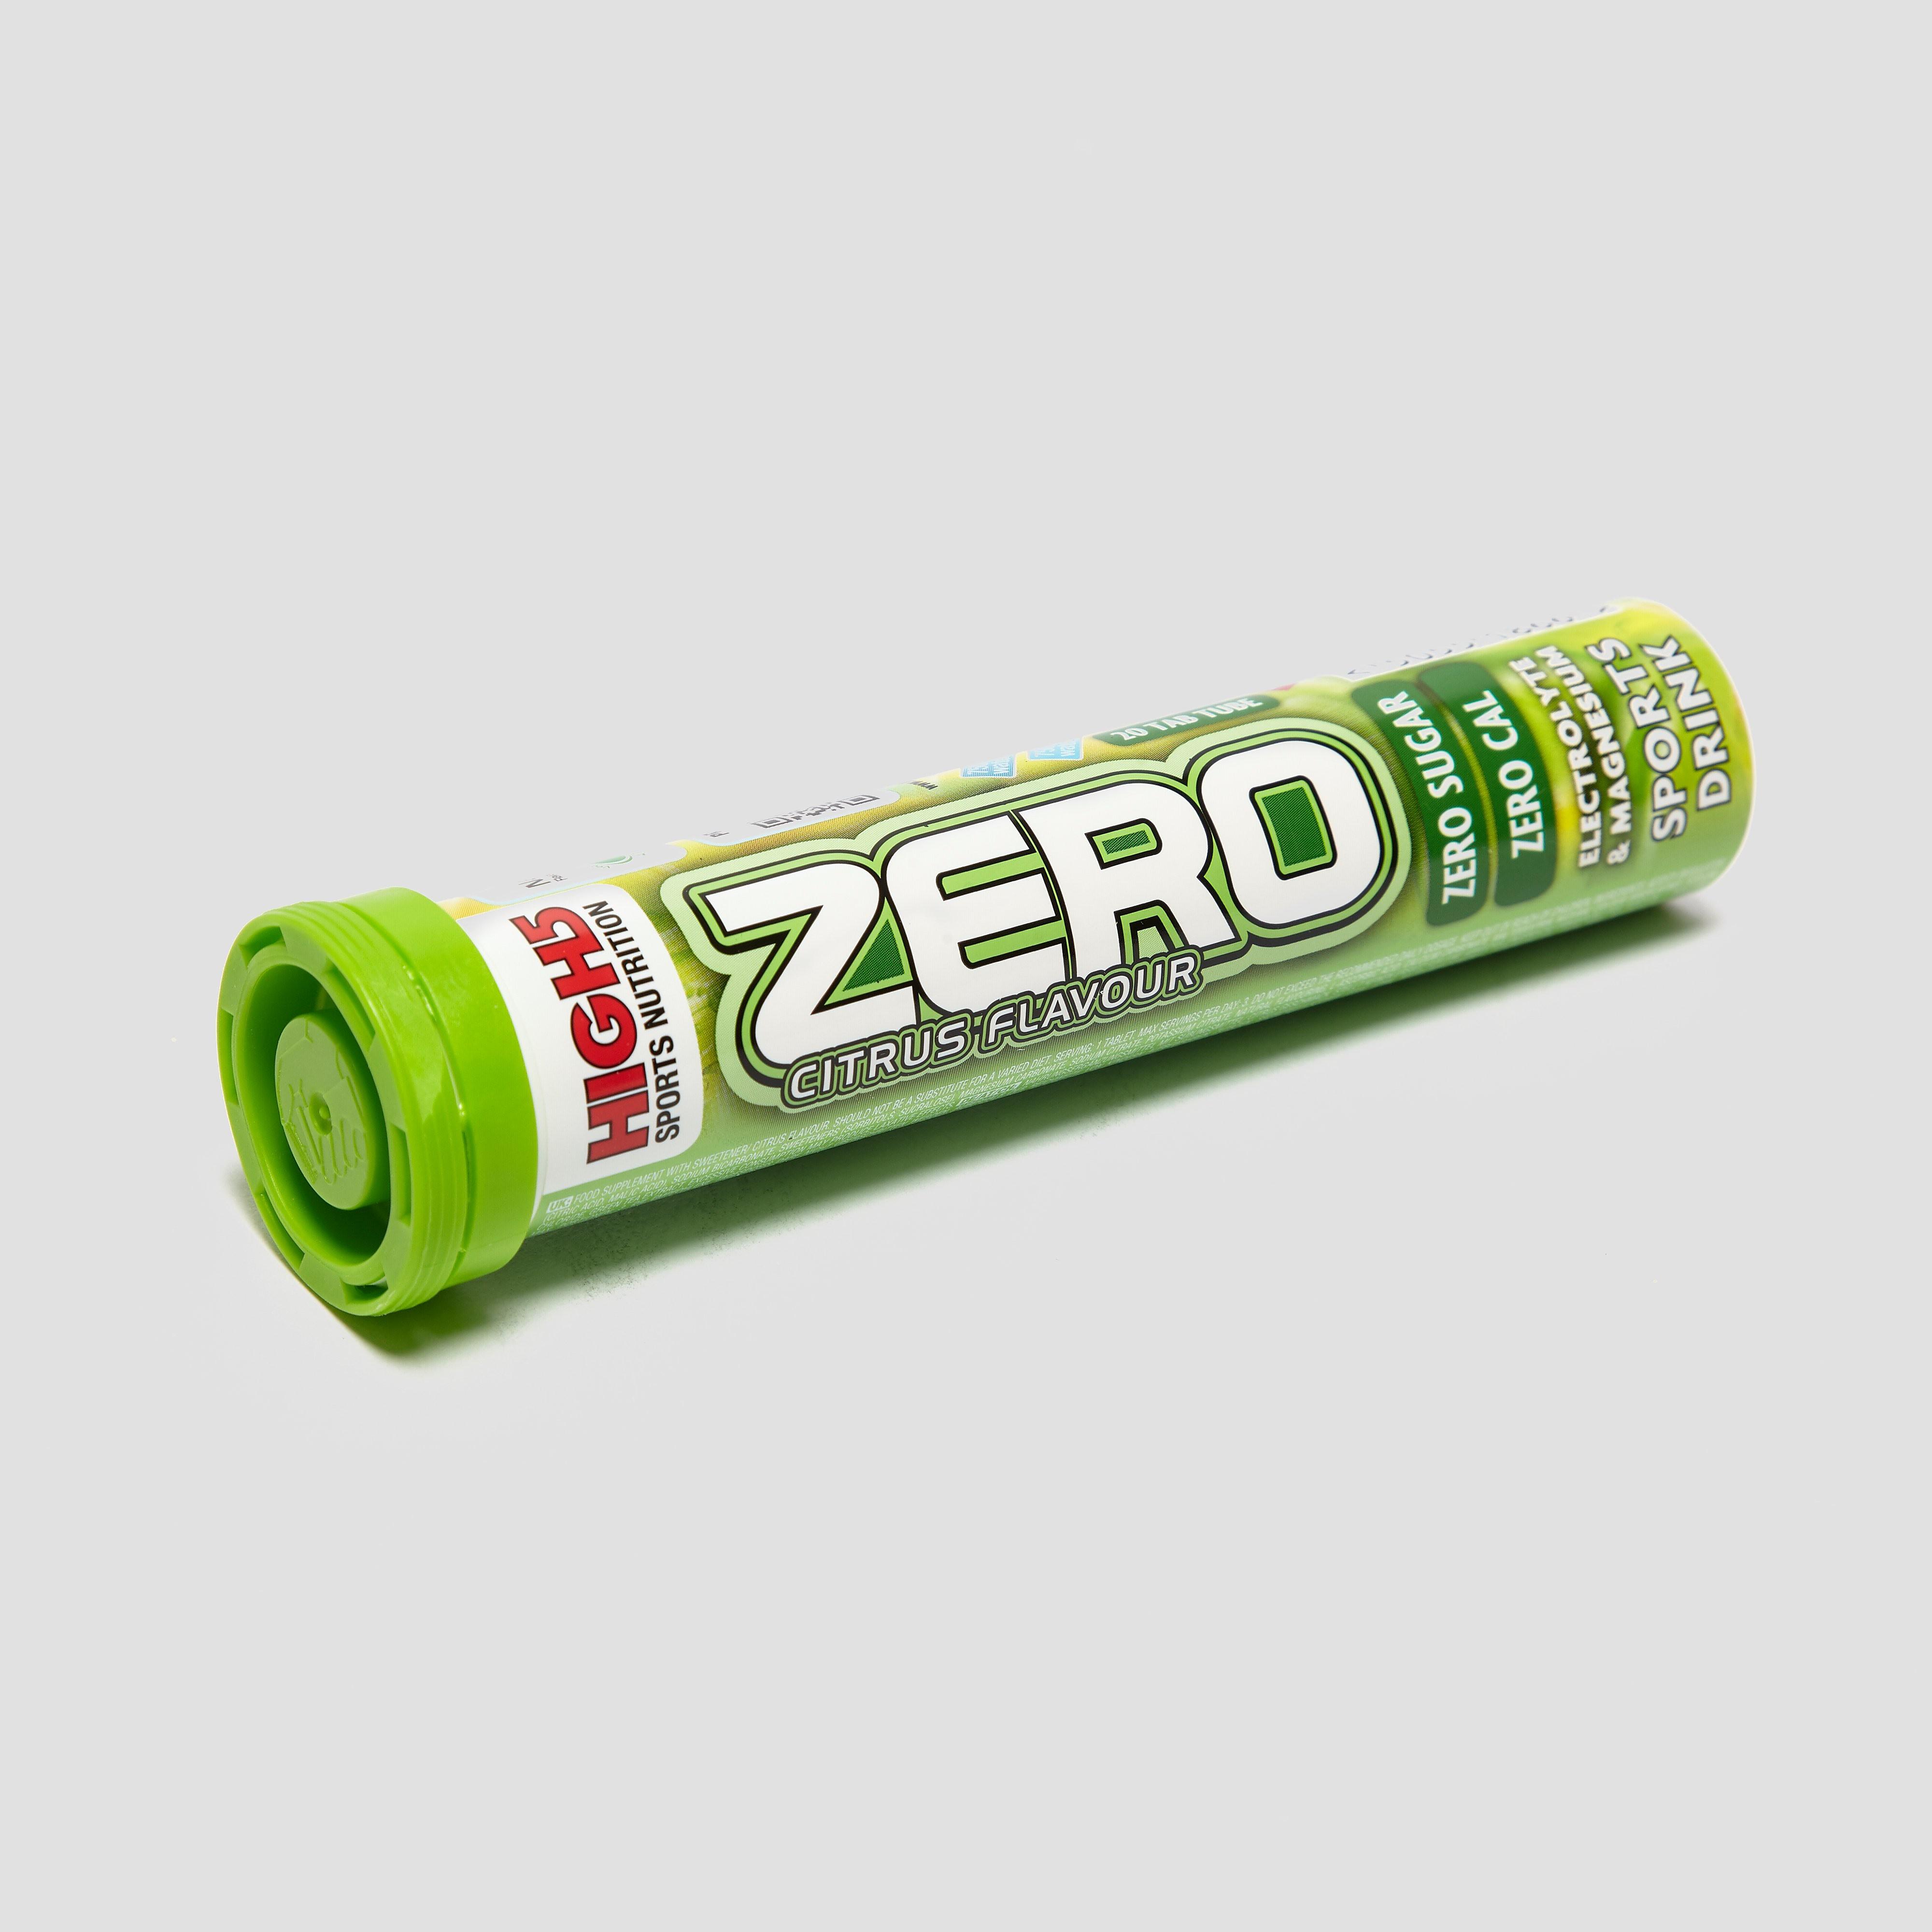 High 5 Zero Electrolyte Sports Drink Tab (20 Tabs)- Citrus